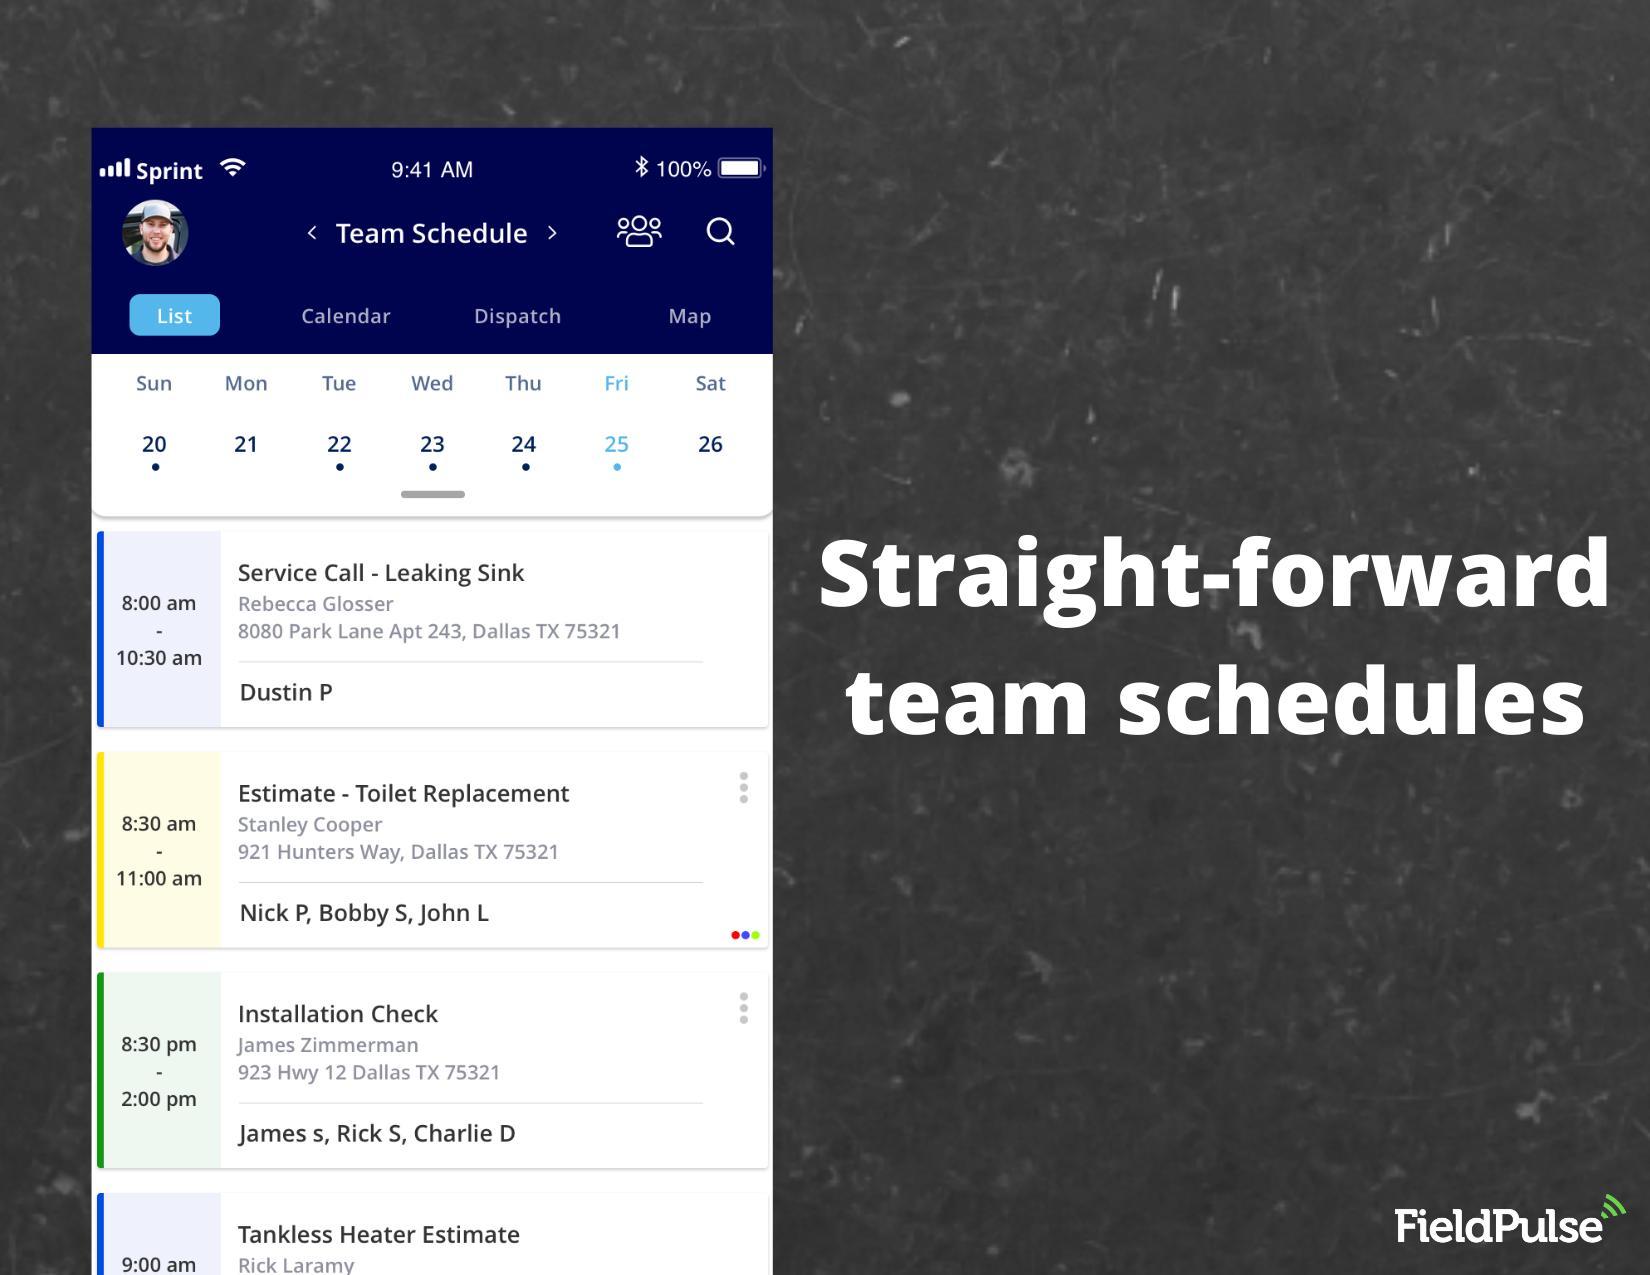 FieldPulse Software - Easily view team schedules